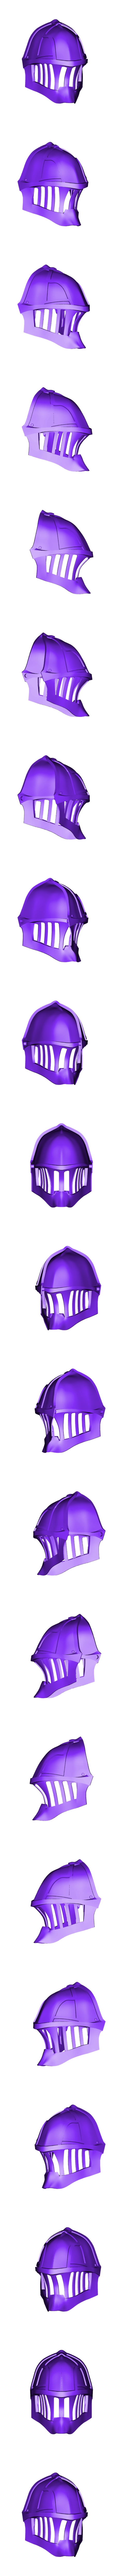 Front_Helmet_v2_5.stl Download free STL file  Iron Musketeer's Helmet (Final Fantasy XI) • 3D printable design, VillainousPropShop